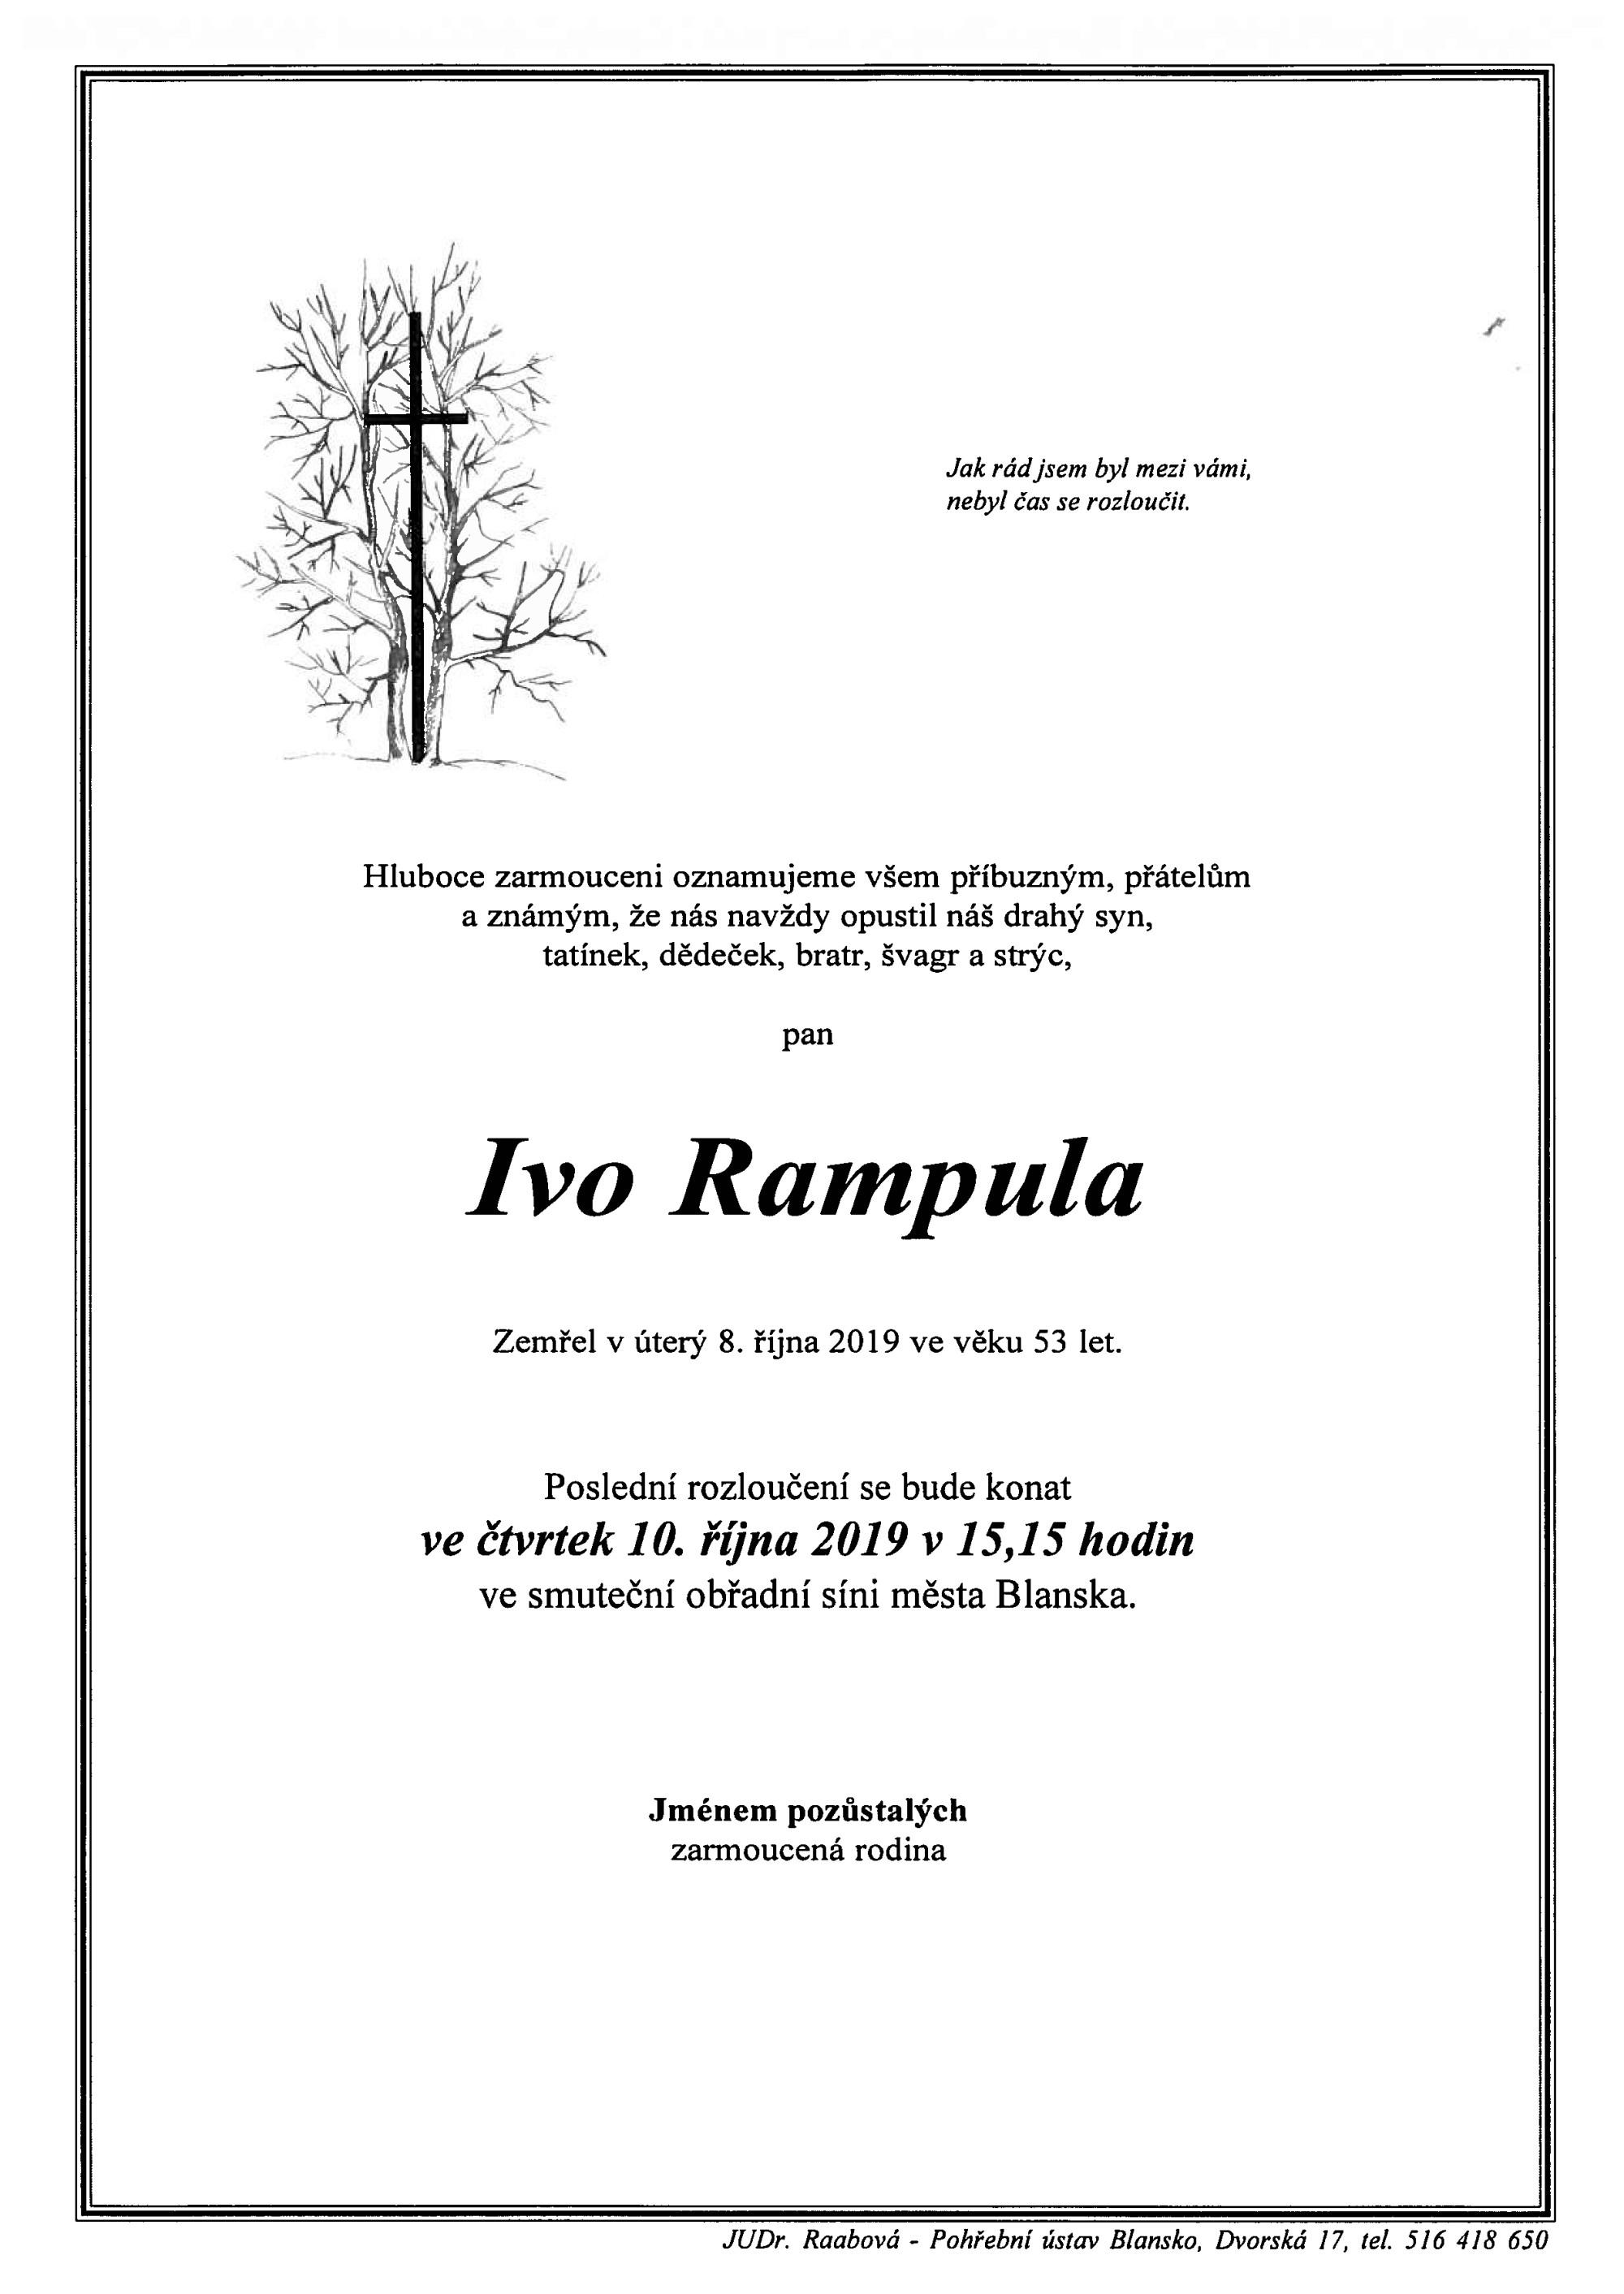 Ivo Rampula